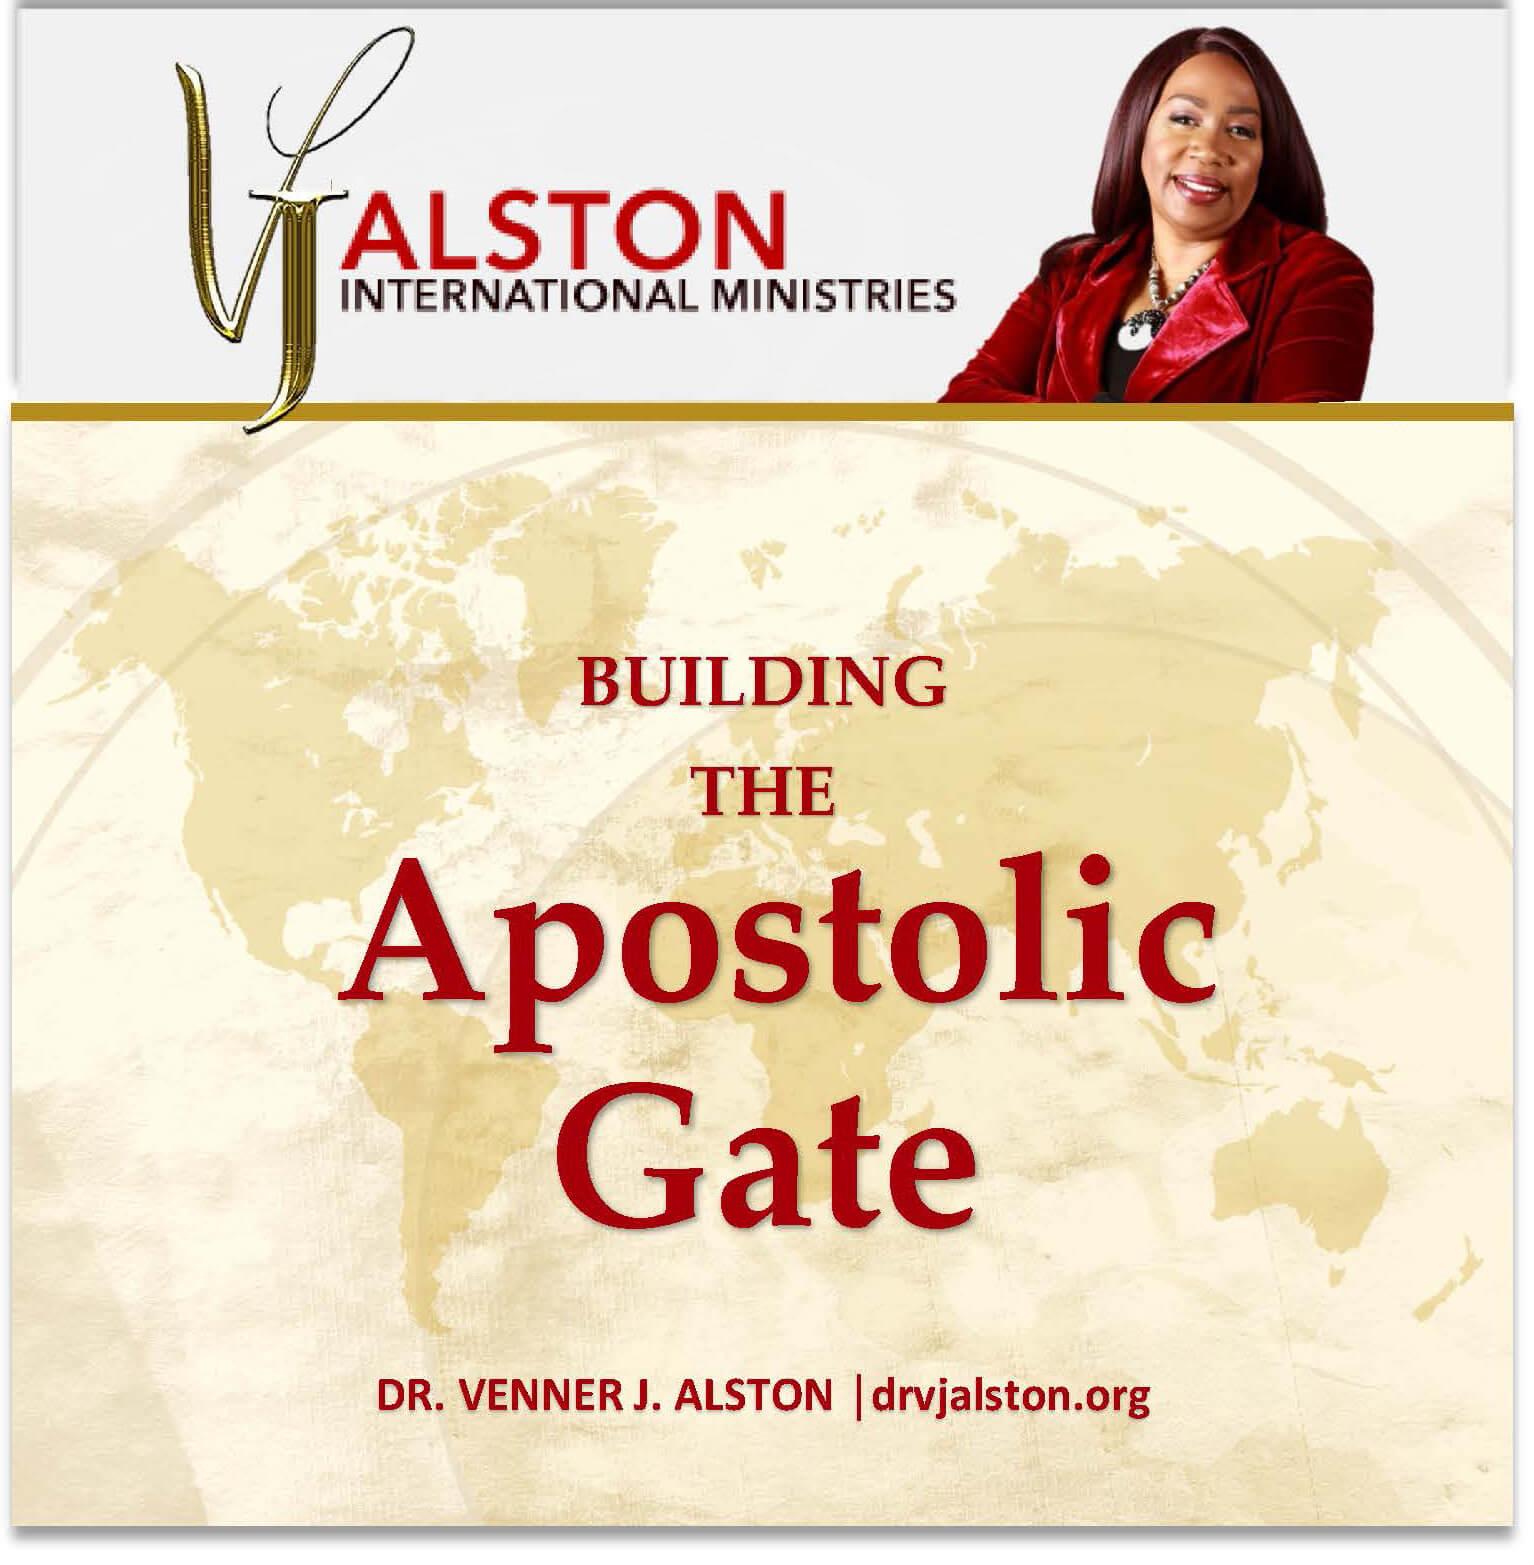 Building the Apostolic Gate